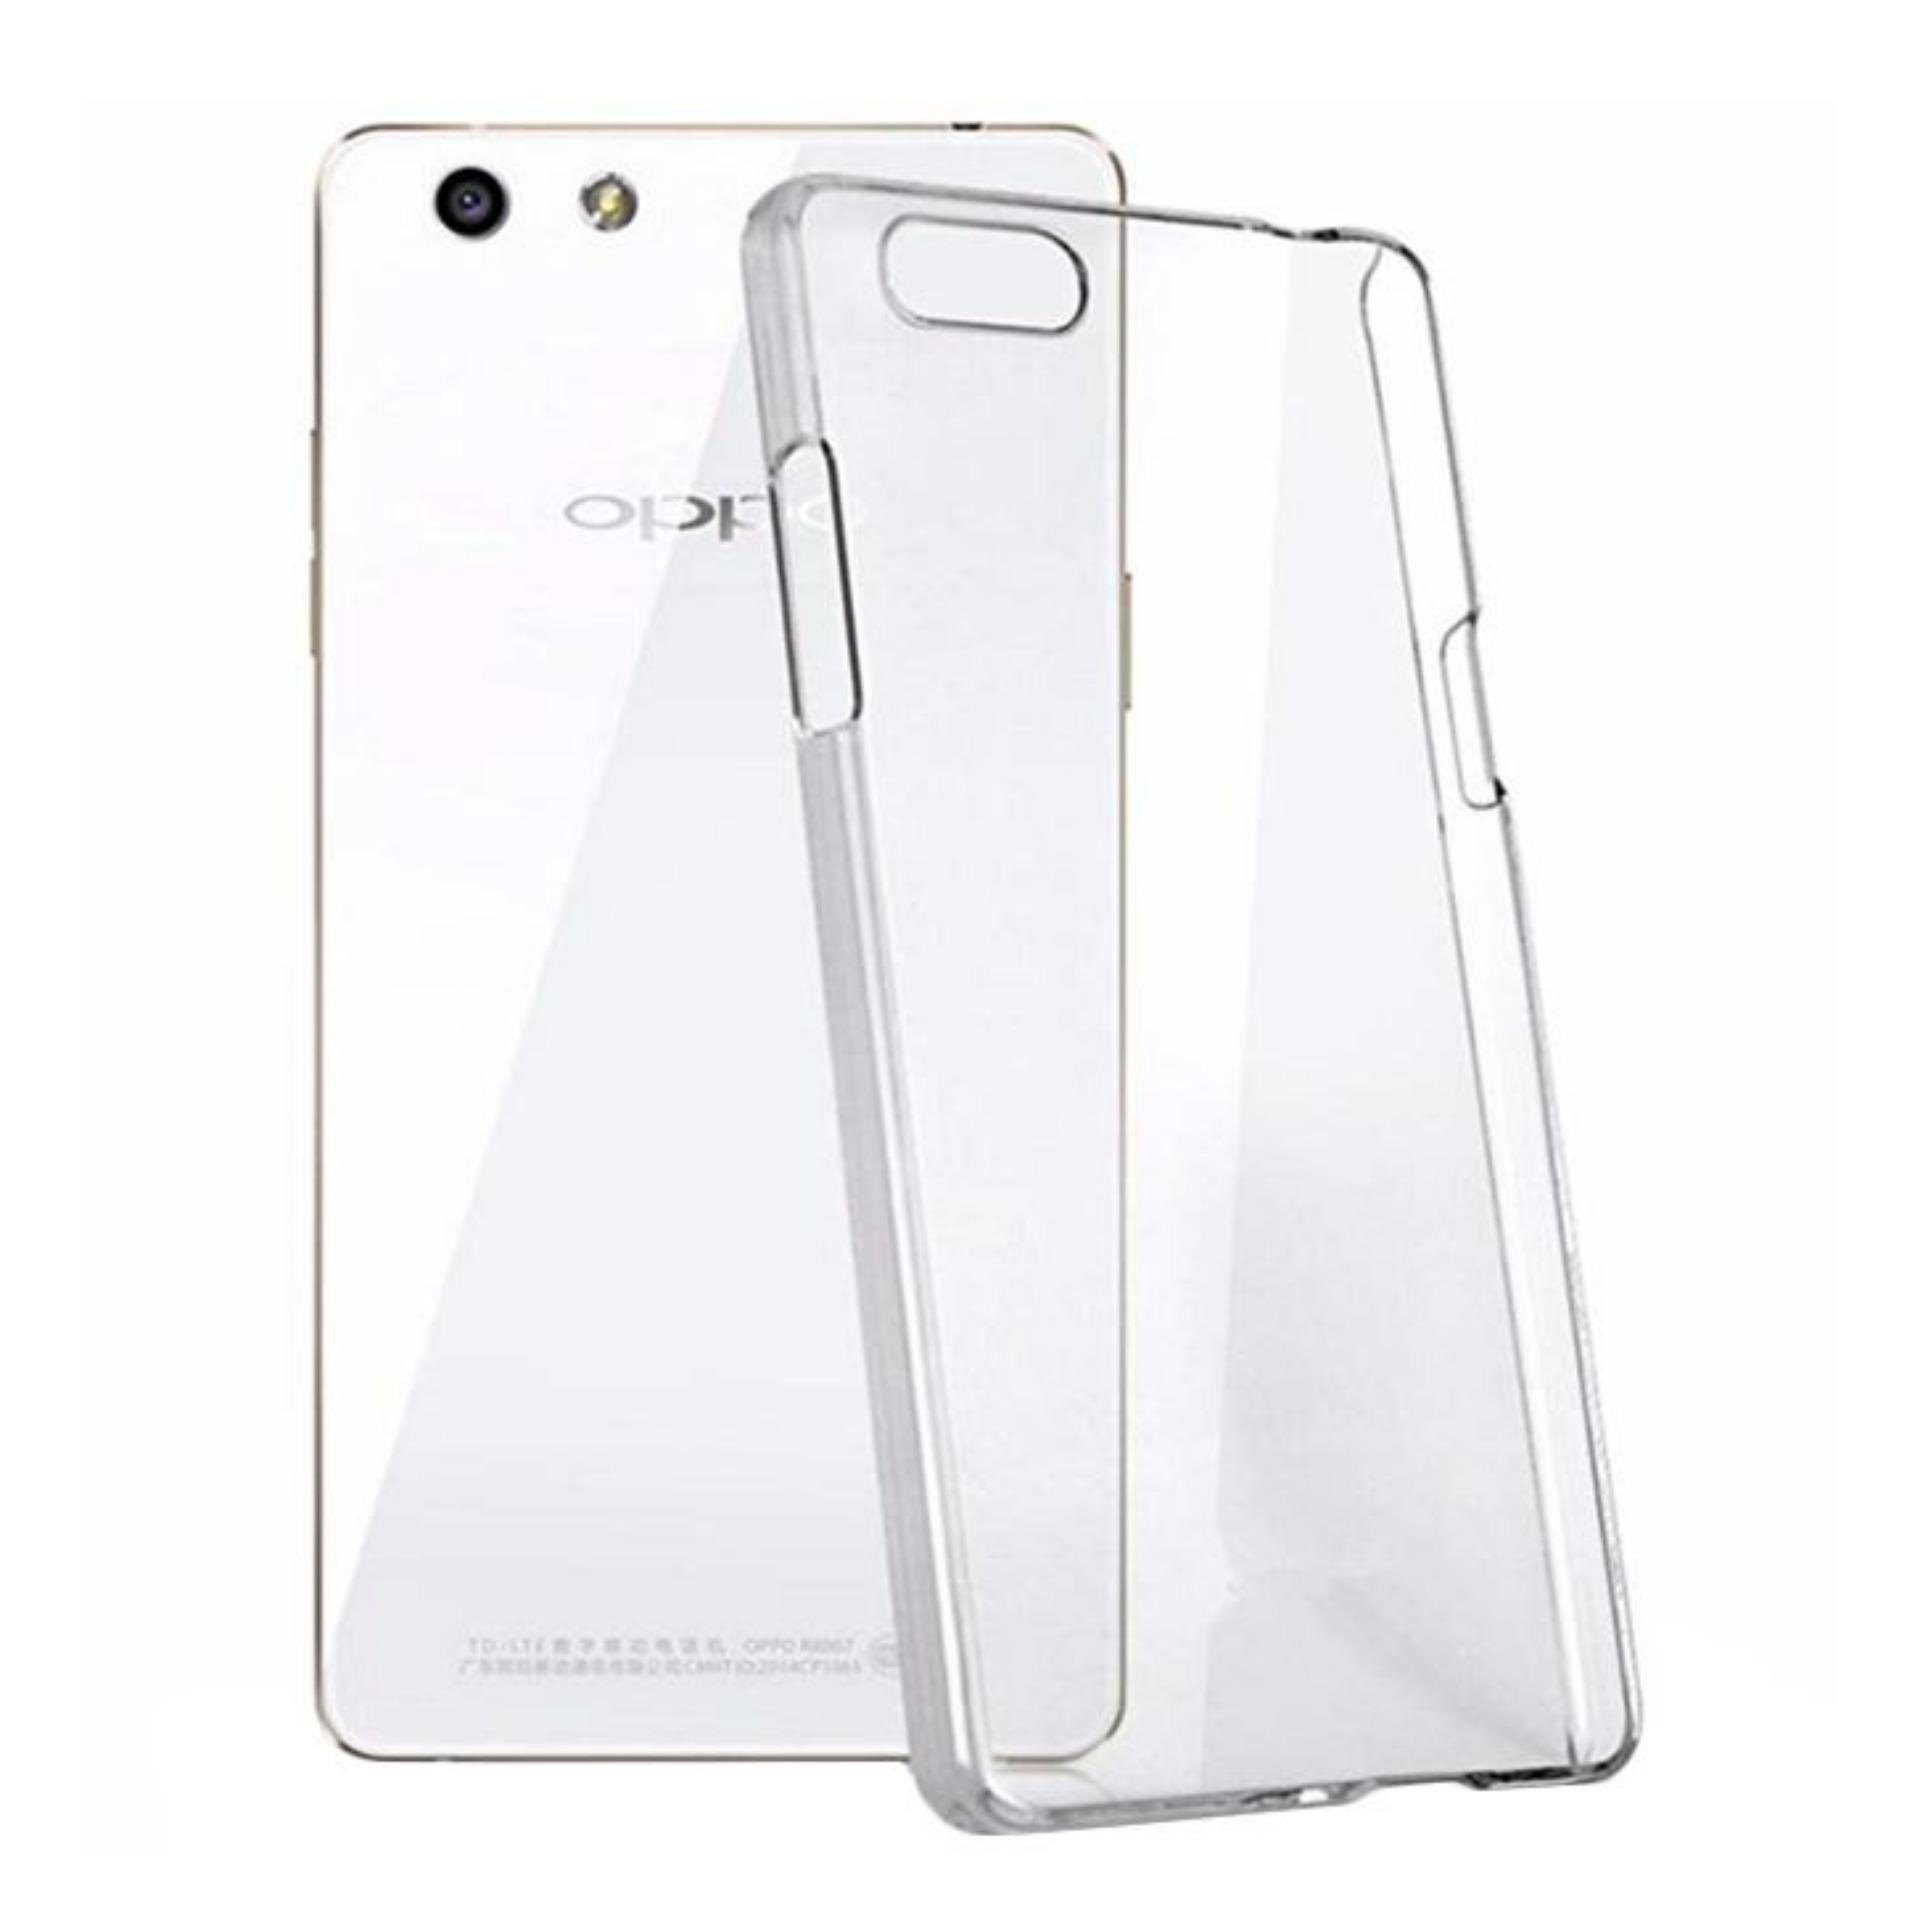 Toko Jual Bendoel Aircase For Meizu M2 Mini Softcase Ultrathin Oppo Find 5 Putih R1 Anti Crash Transparan